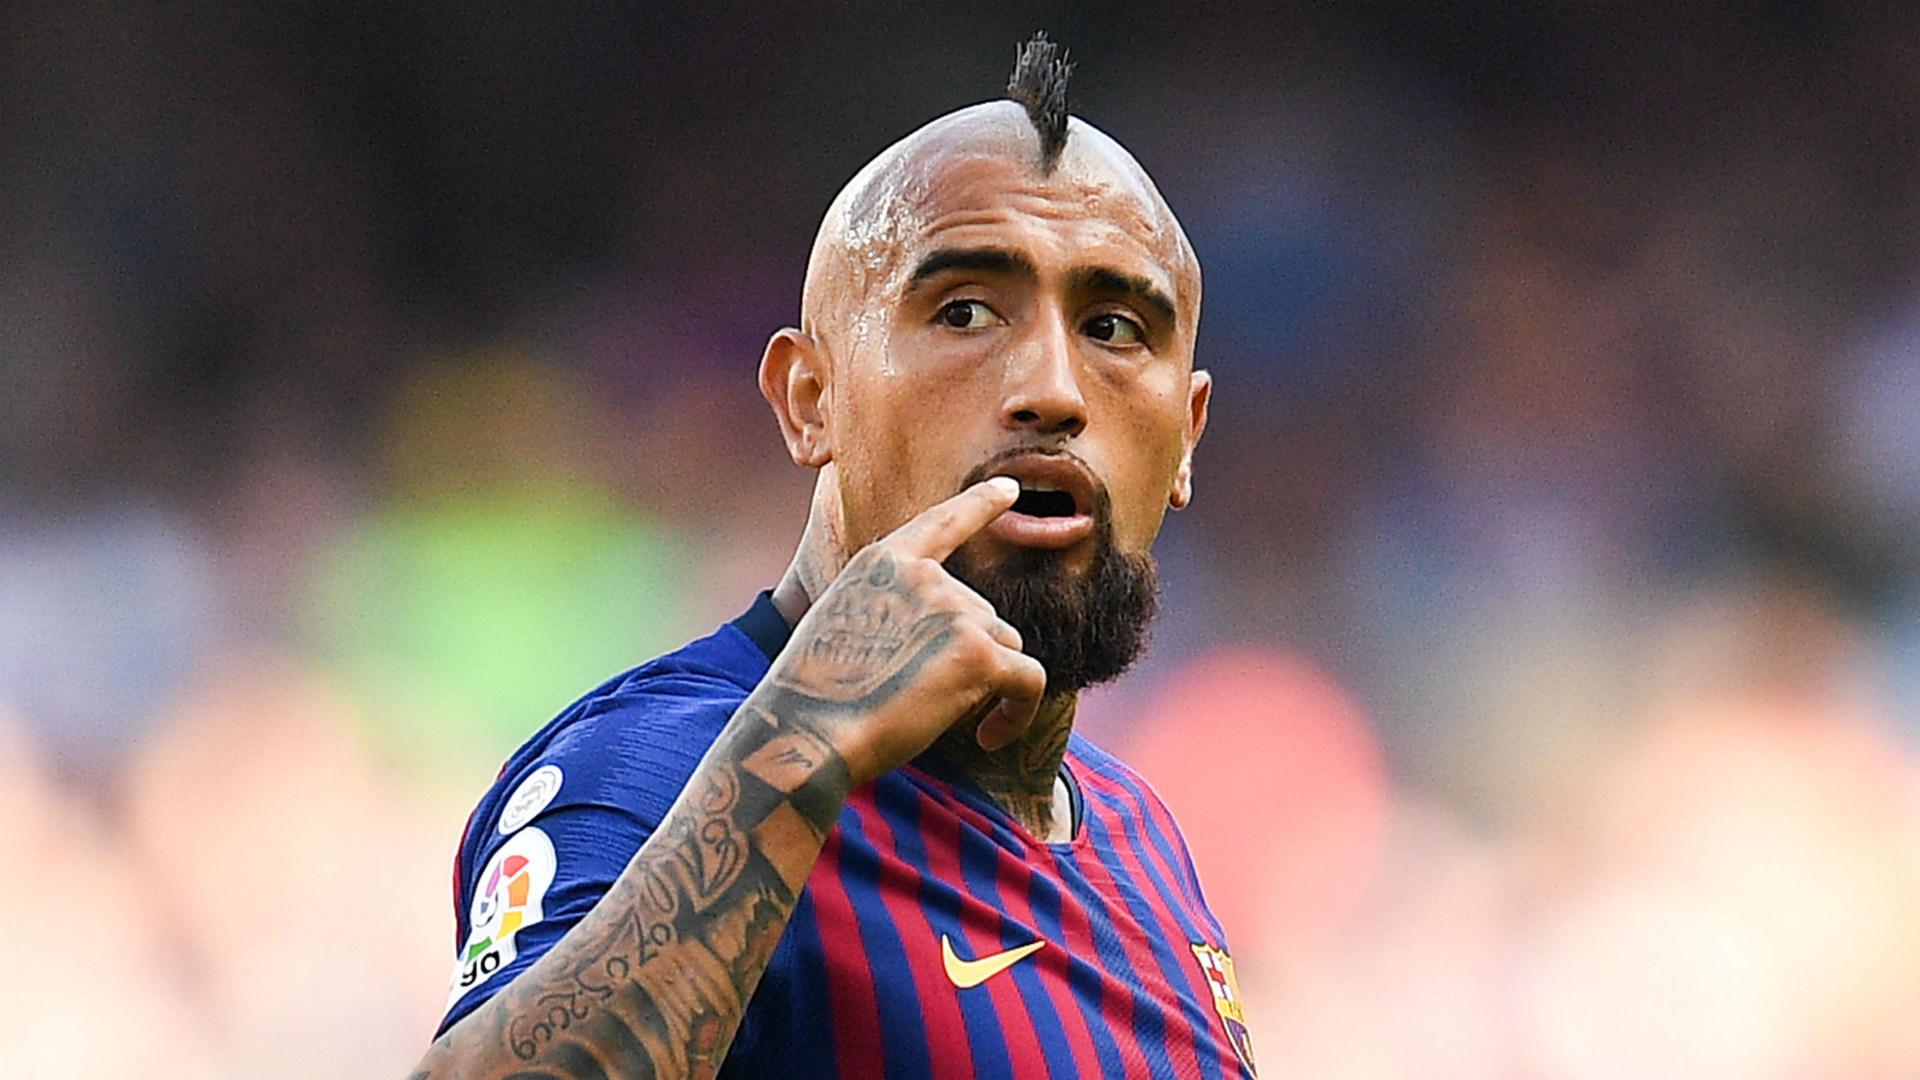 Barcelonas Hijacking Of Arturo Vidal From Inter Has Backfired Badly Goal Com